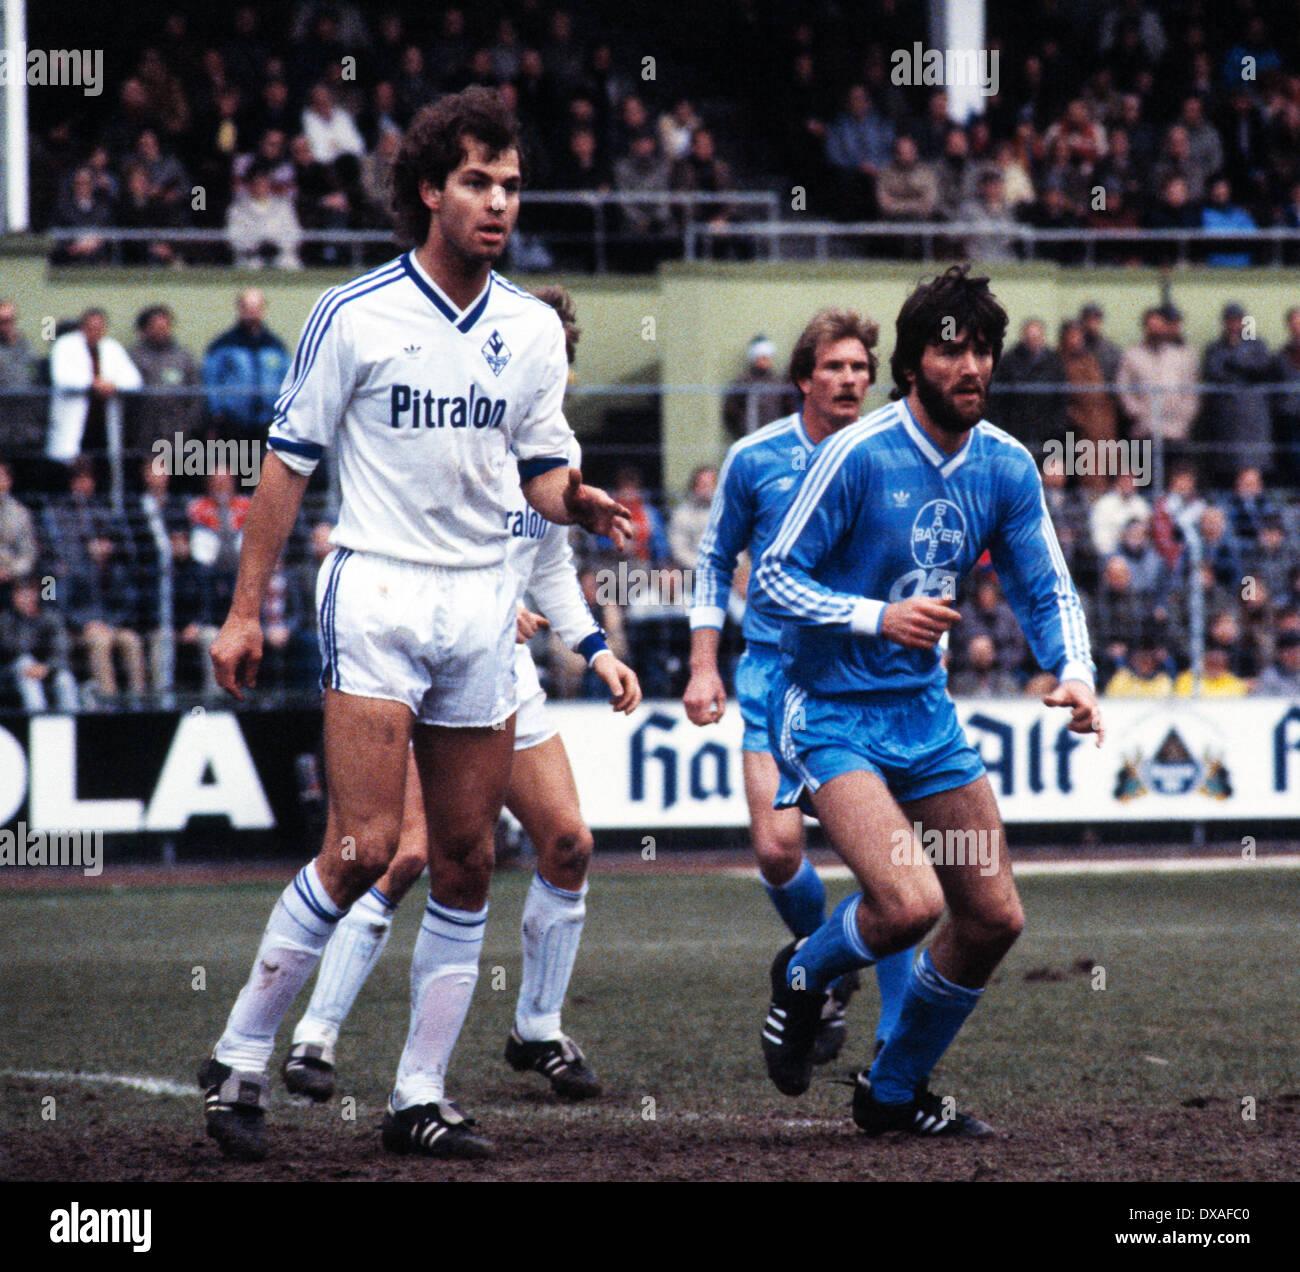 football, Bundesliga, 1984/1985, Grotenburg Stadium, FC Bayer 05 Uerdingen versus SV Waldhof Mannheim 2:2, scene of the match, f.l.t.r. Dieter Schlindwein (SVW), Wolfgang Schaefer (Bayer), Friedhelm Funkel (Bayer) - Stock Image